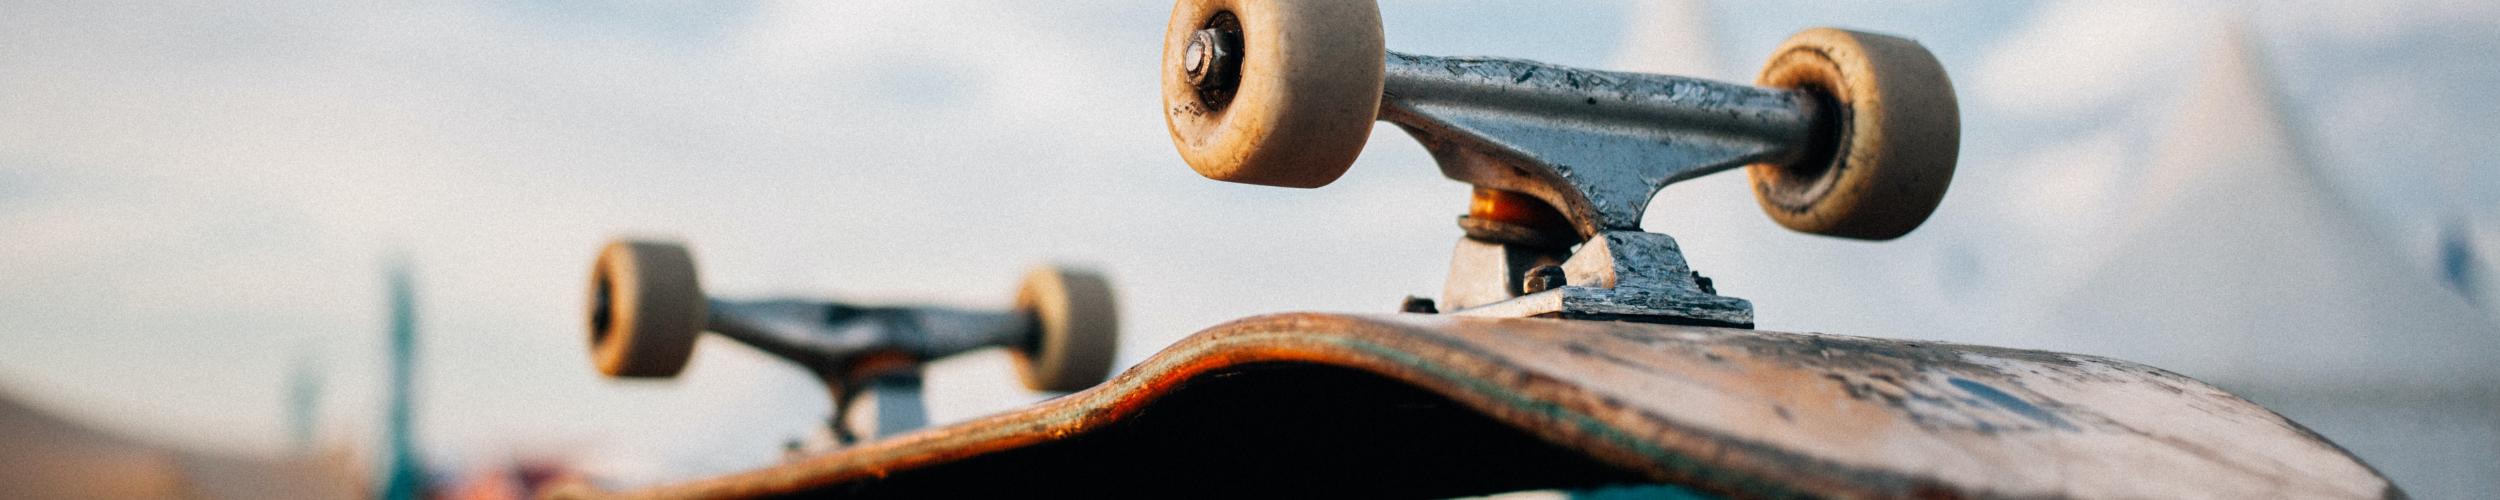 Skateboardinitiatie #VANRSL